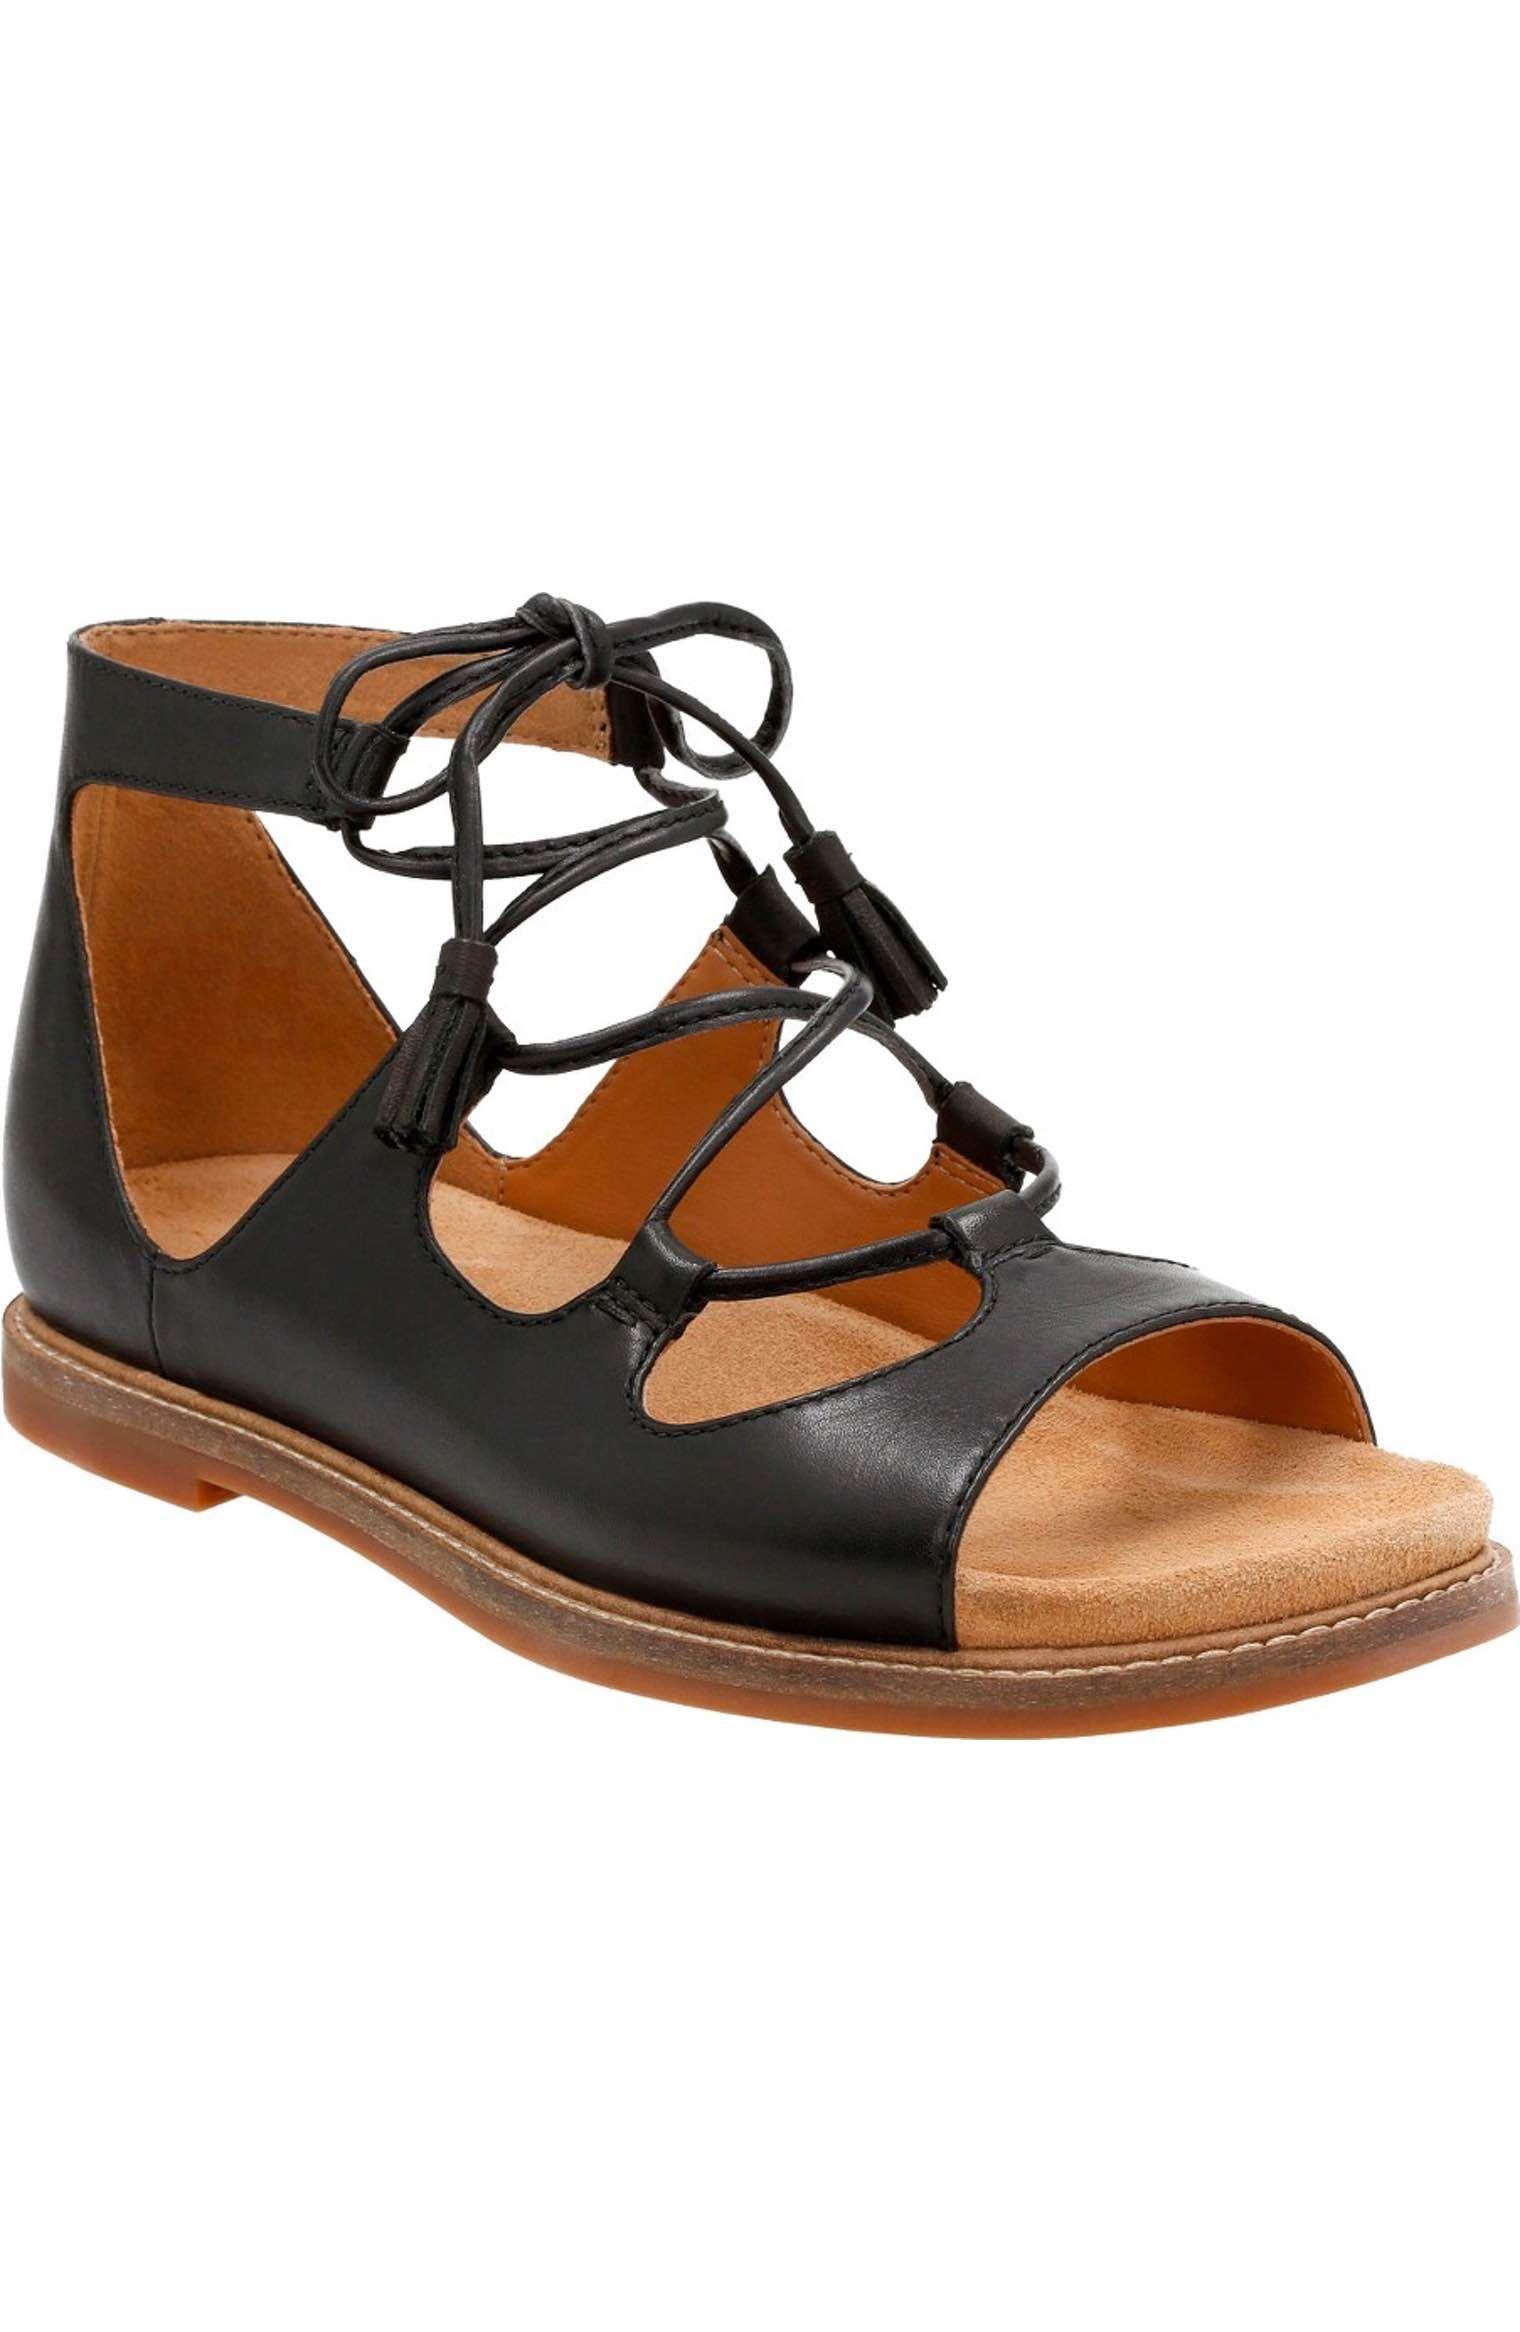 15d98abfb48 Main Image - Clarks® Corsio Dallas Ghillie Sandal (Women)